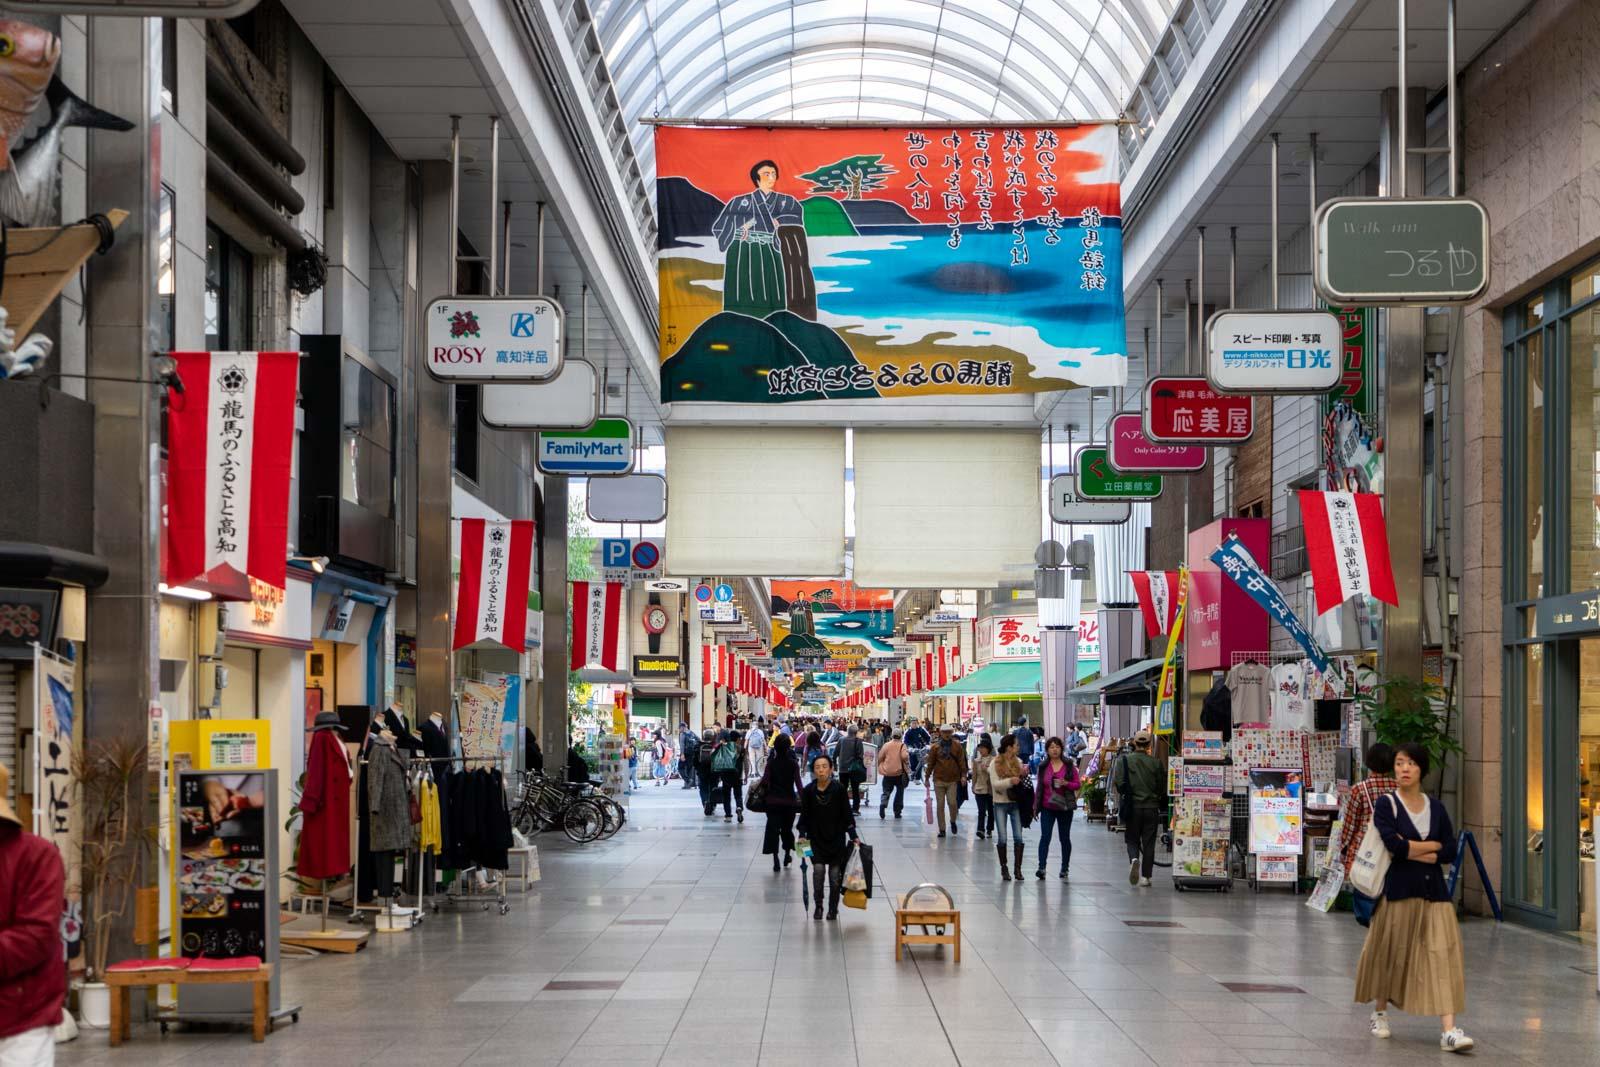 Obiyamachi Shopping Arcade, Kochi City, Japan